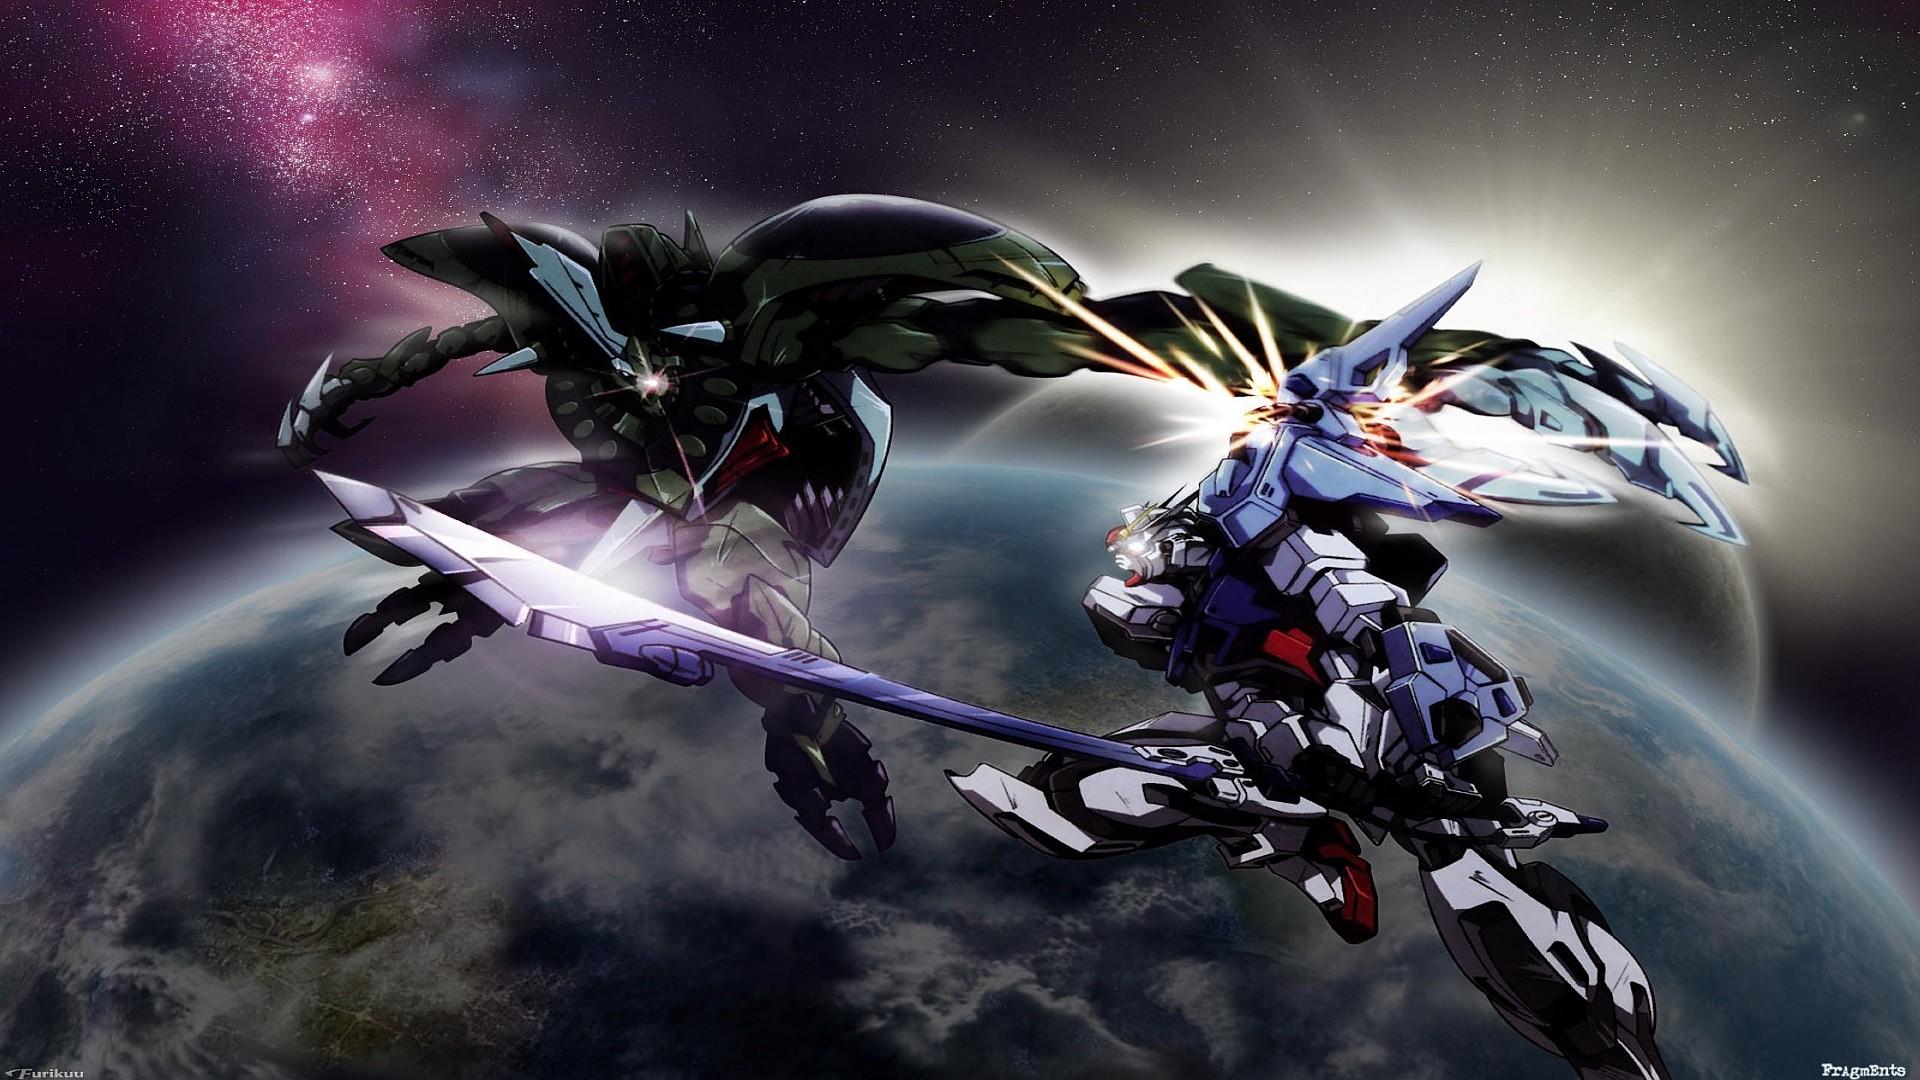 Tags: Anime, Mobile Suit Gundam SEED, Strike Gundam, Fanmade Wallpaper,  Edited